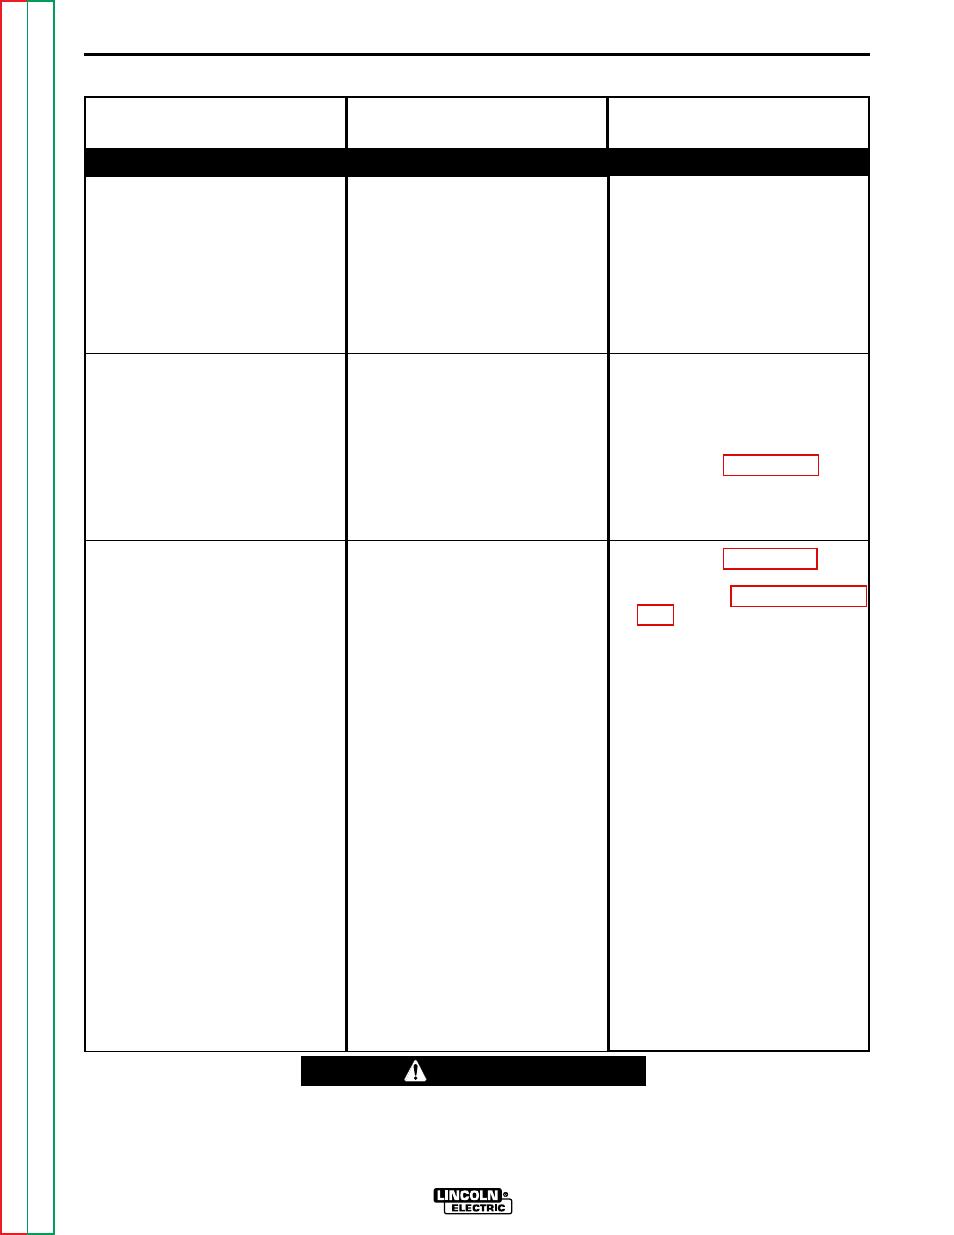 medium resolution of troubleshooting repair caution lincoln electric idealarc sp 250 manuel d utilisation page 52 113